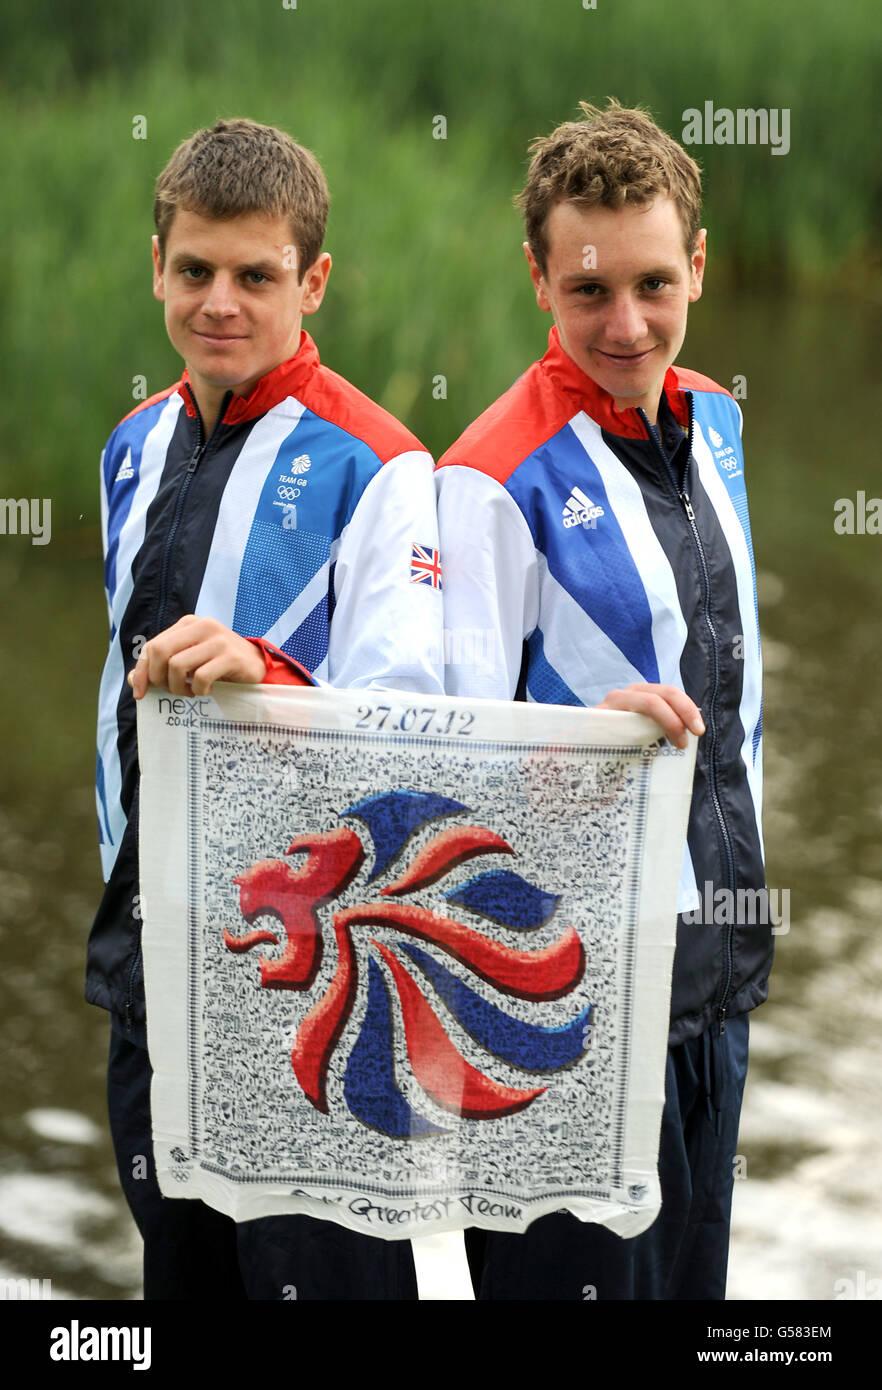 Olympische Spiele - Olympiade 2012 in London - Team GB Kitting heraus - Triathlon - Loughborough Universität Stockfoto